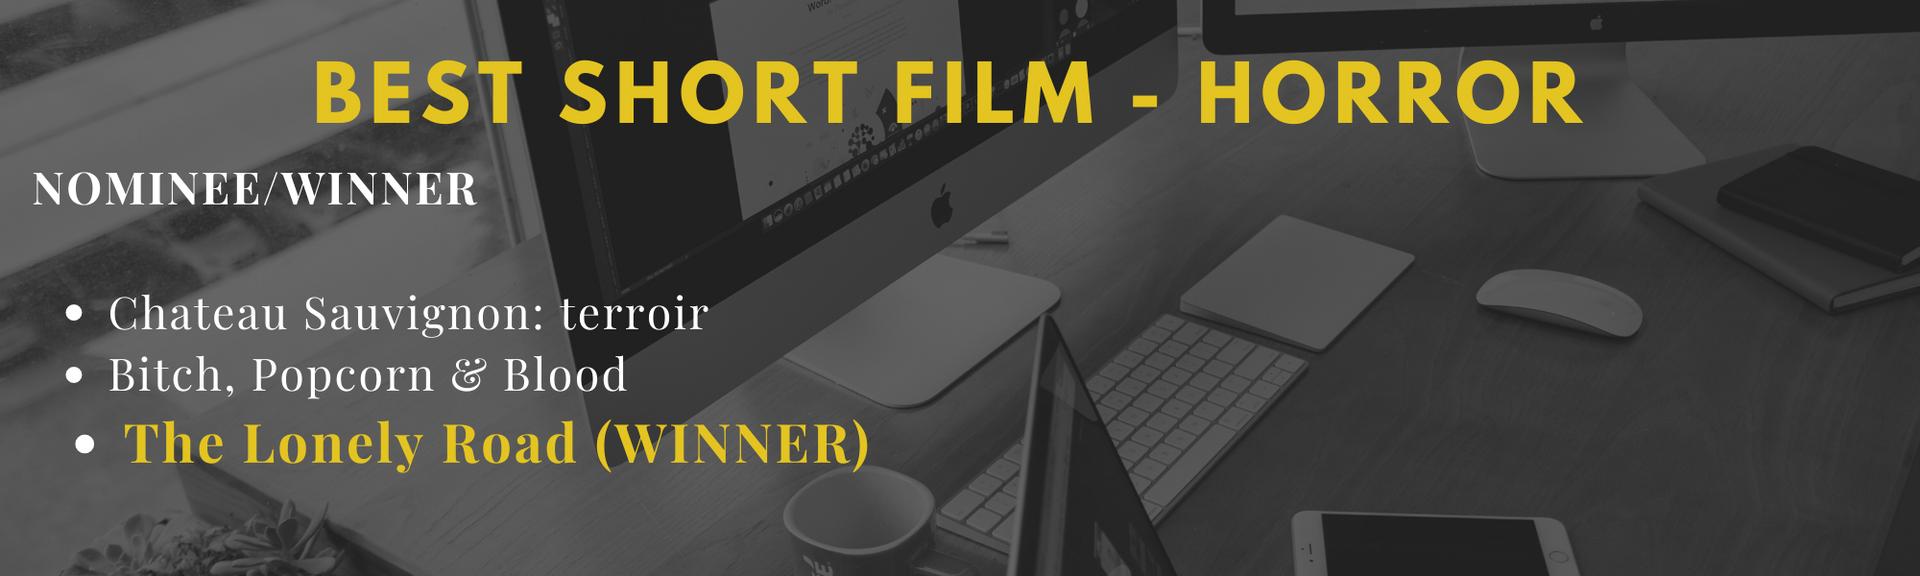 Best Short Film -